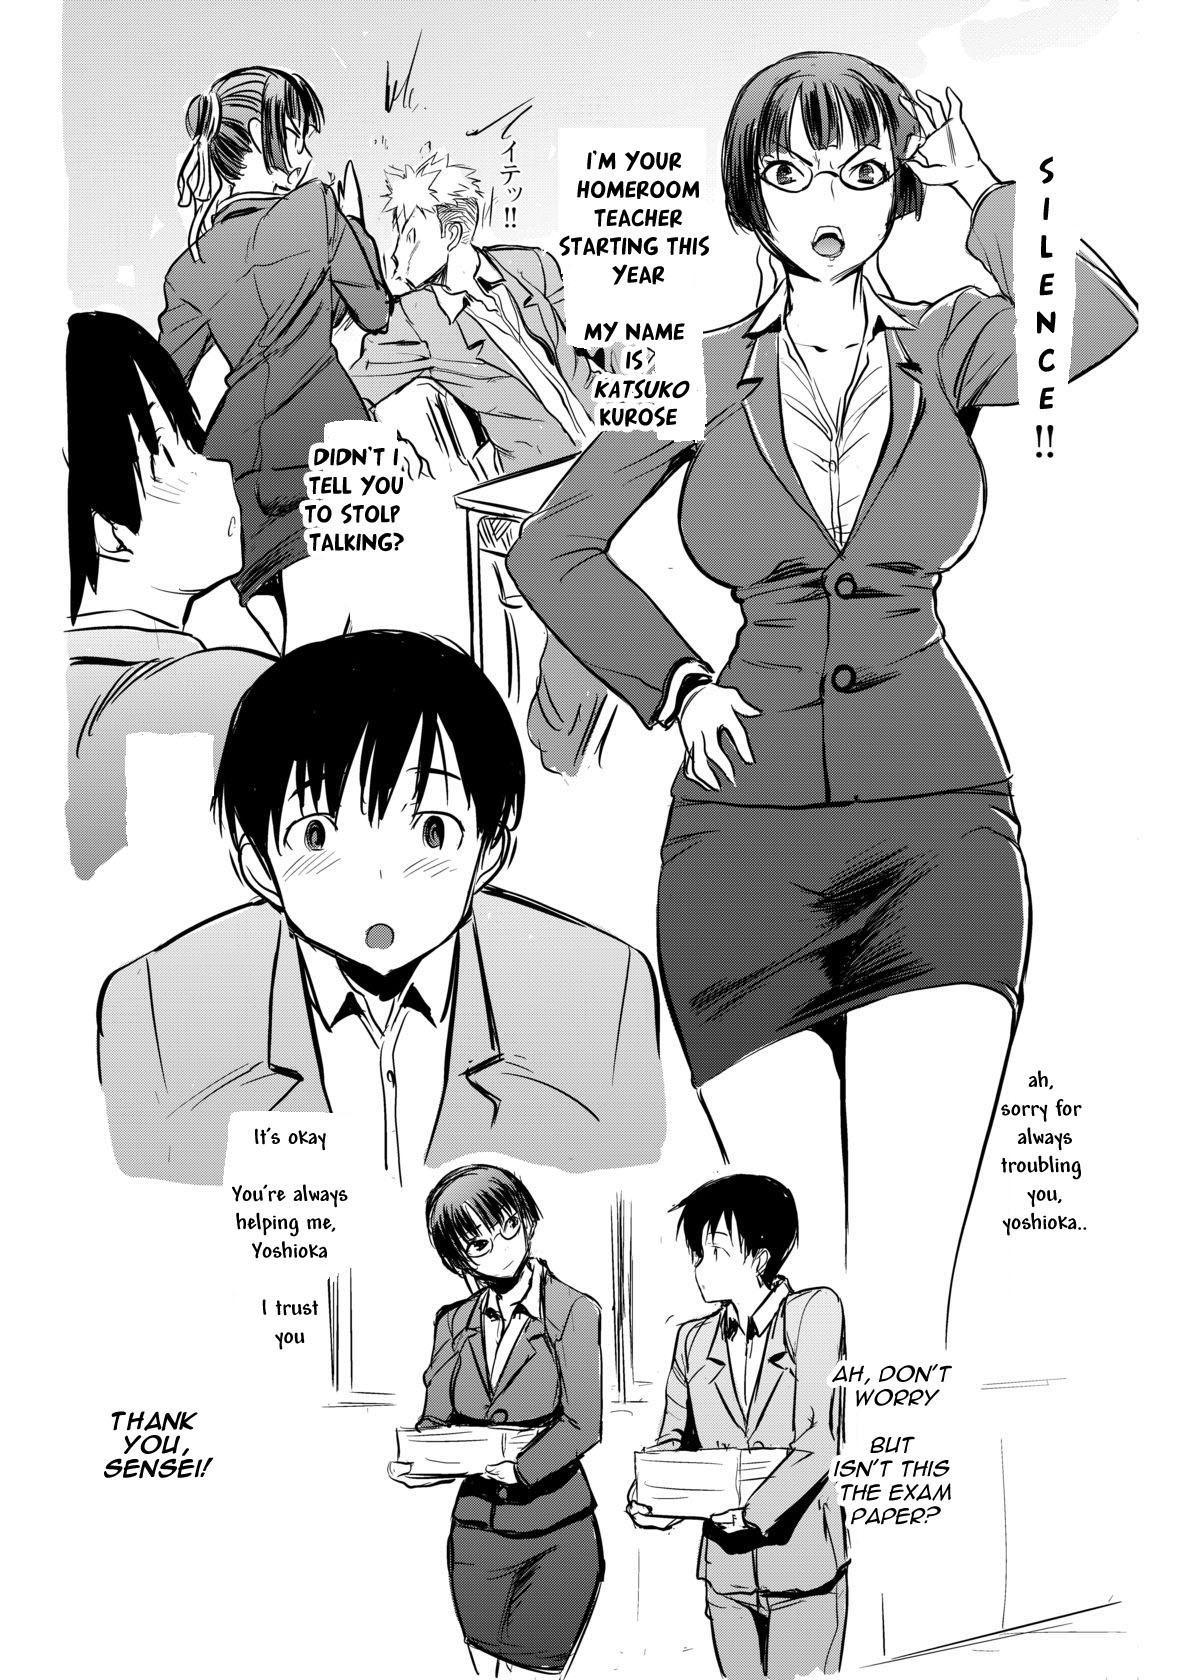 UnSweet Kurose Katsuko Plus Are Kara 8